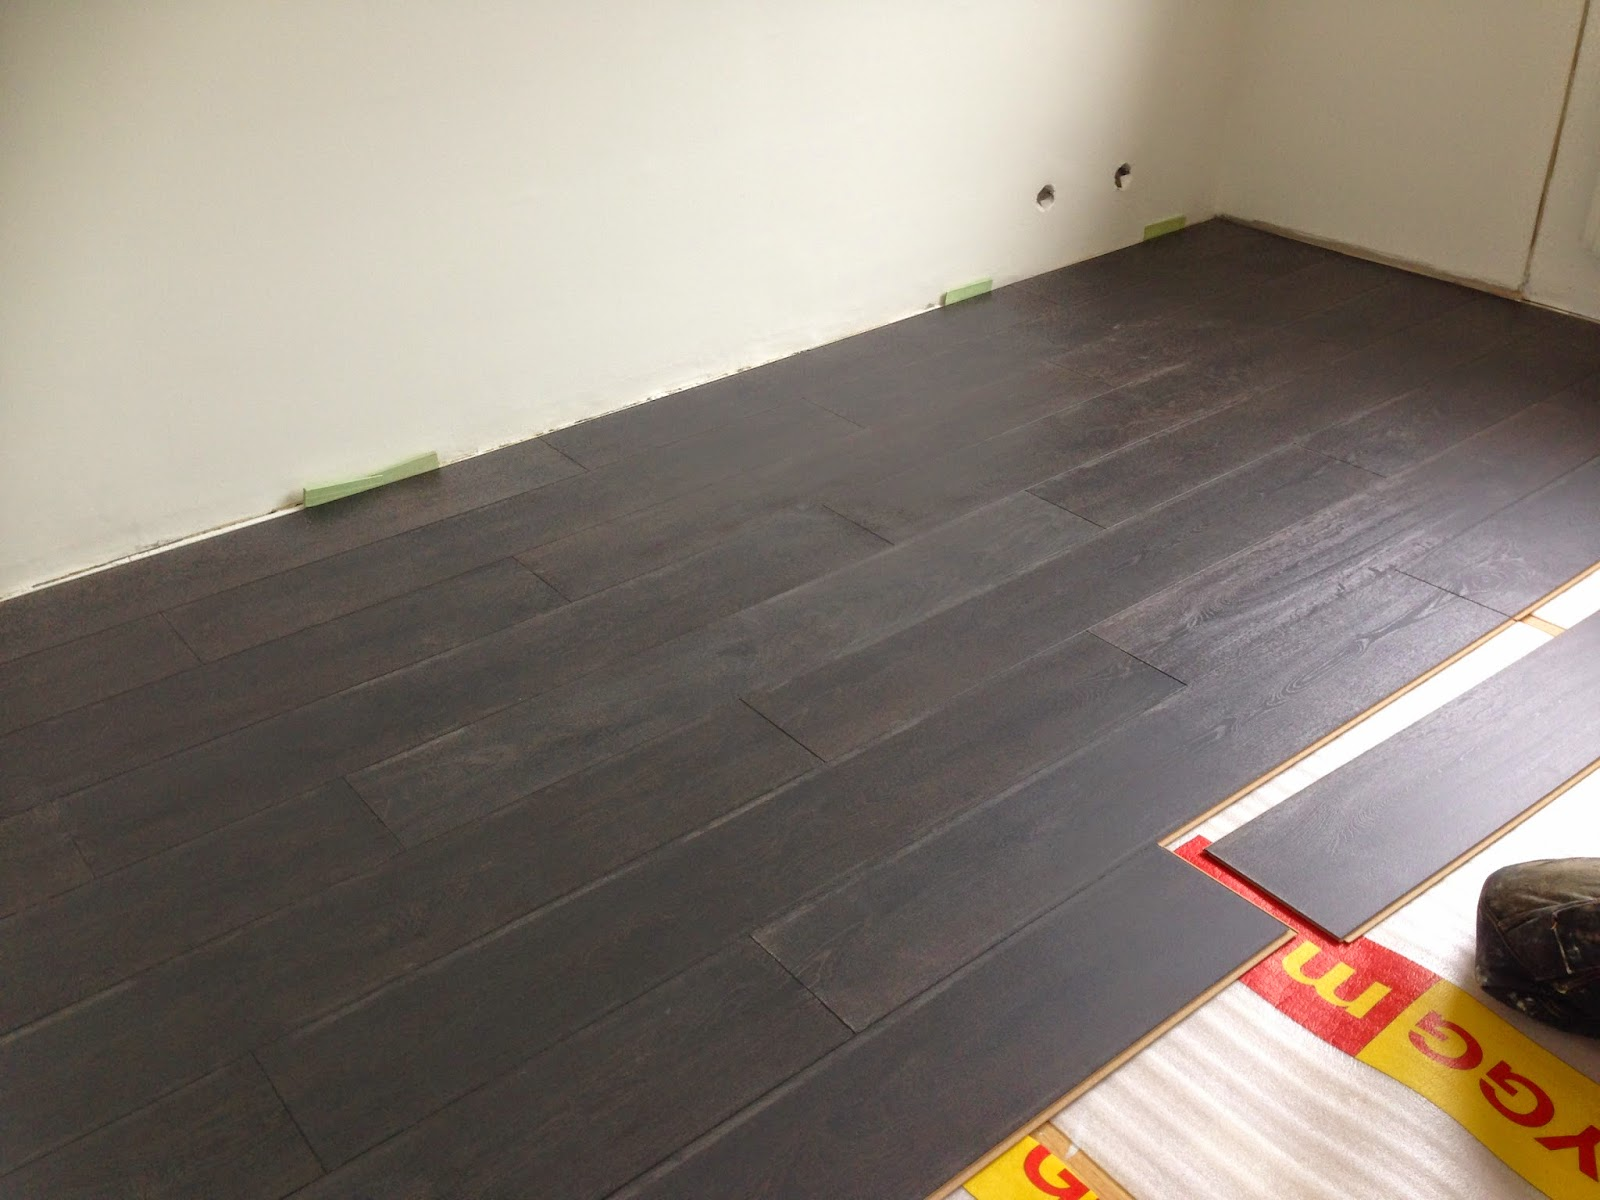 Klickgolv ikea lovely ikea laminate flooring ikea tundra maple laminate flooring from ikea - Parquet ikea tundra ...